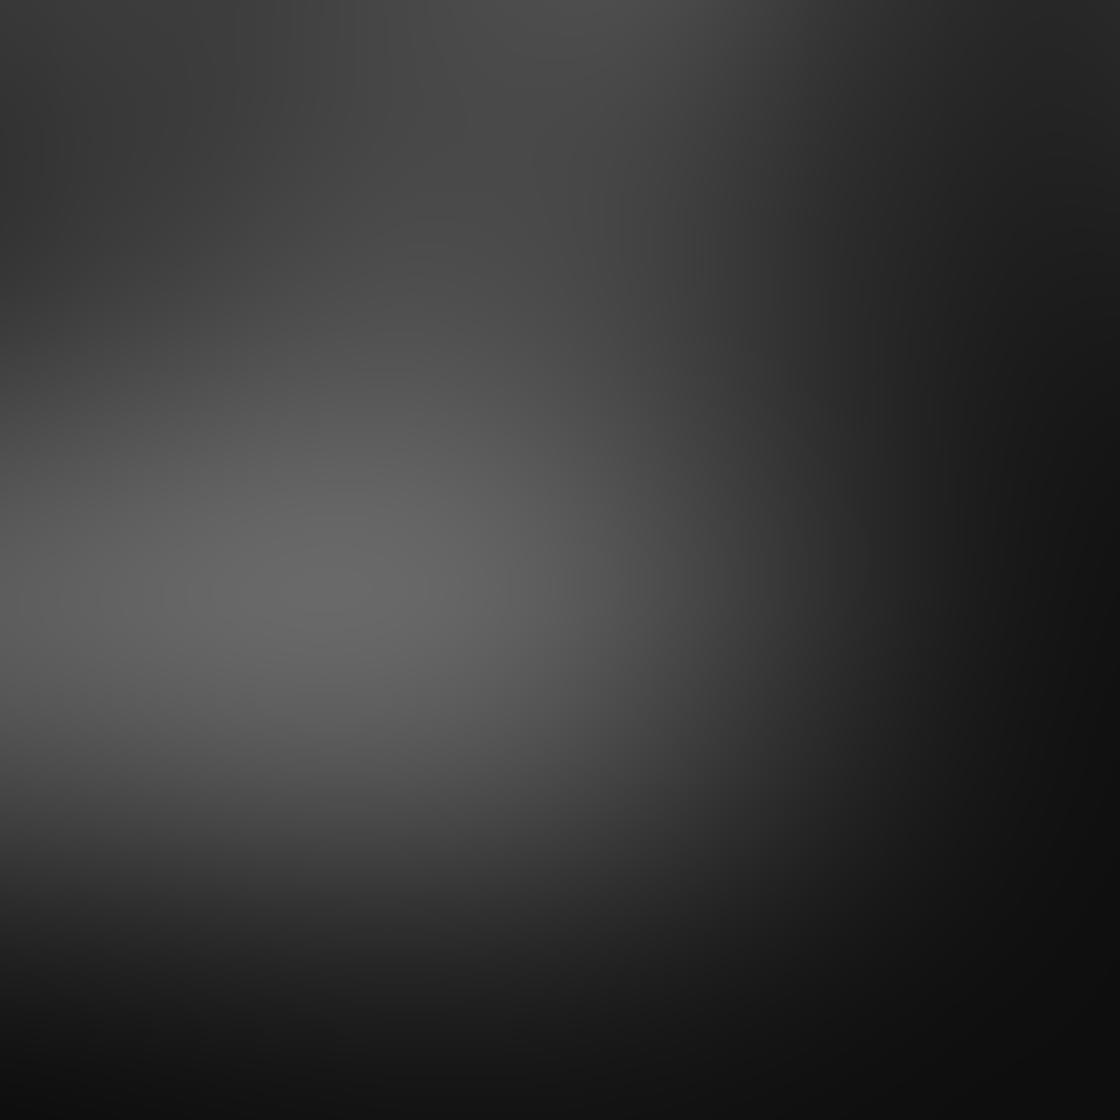 iPhone Photo Shadows 21